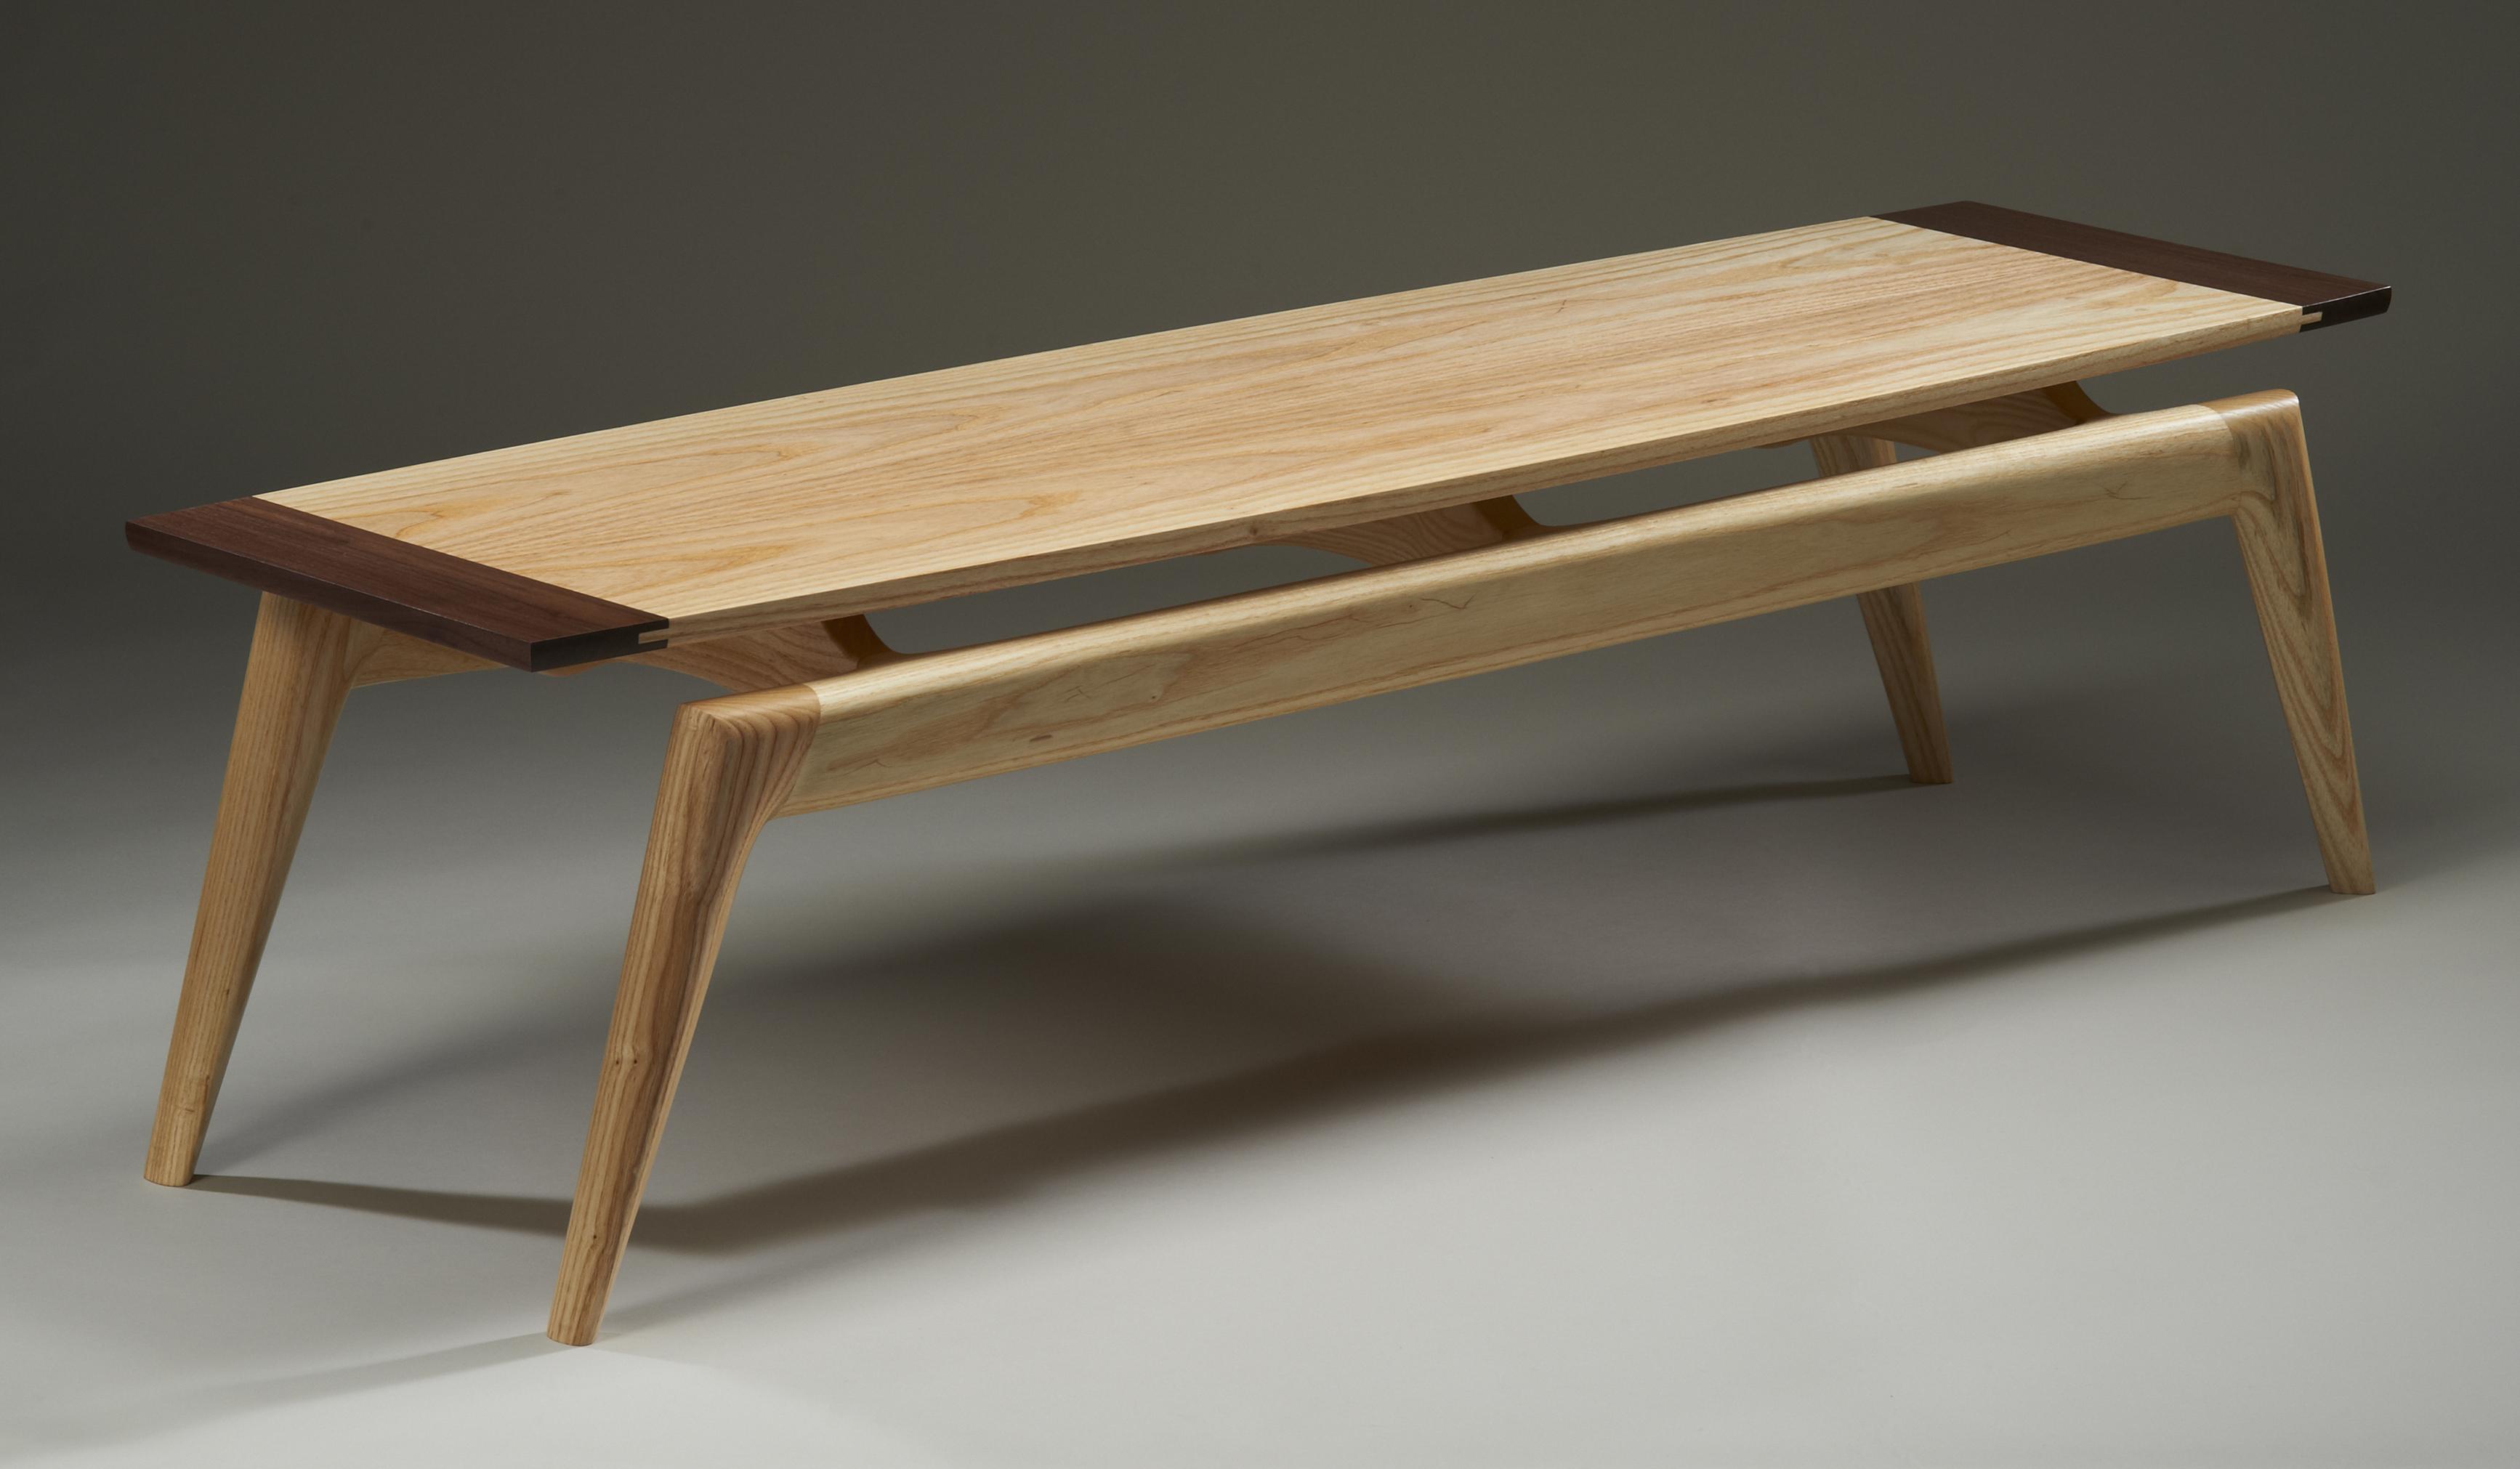 coffee table copy. Modernist Furniture Maker   Ben Rosenberg   ModernAsheville com